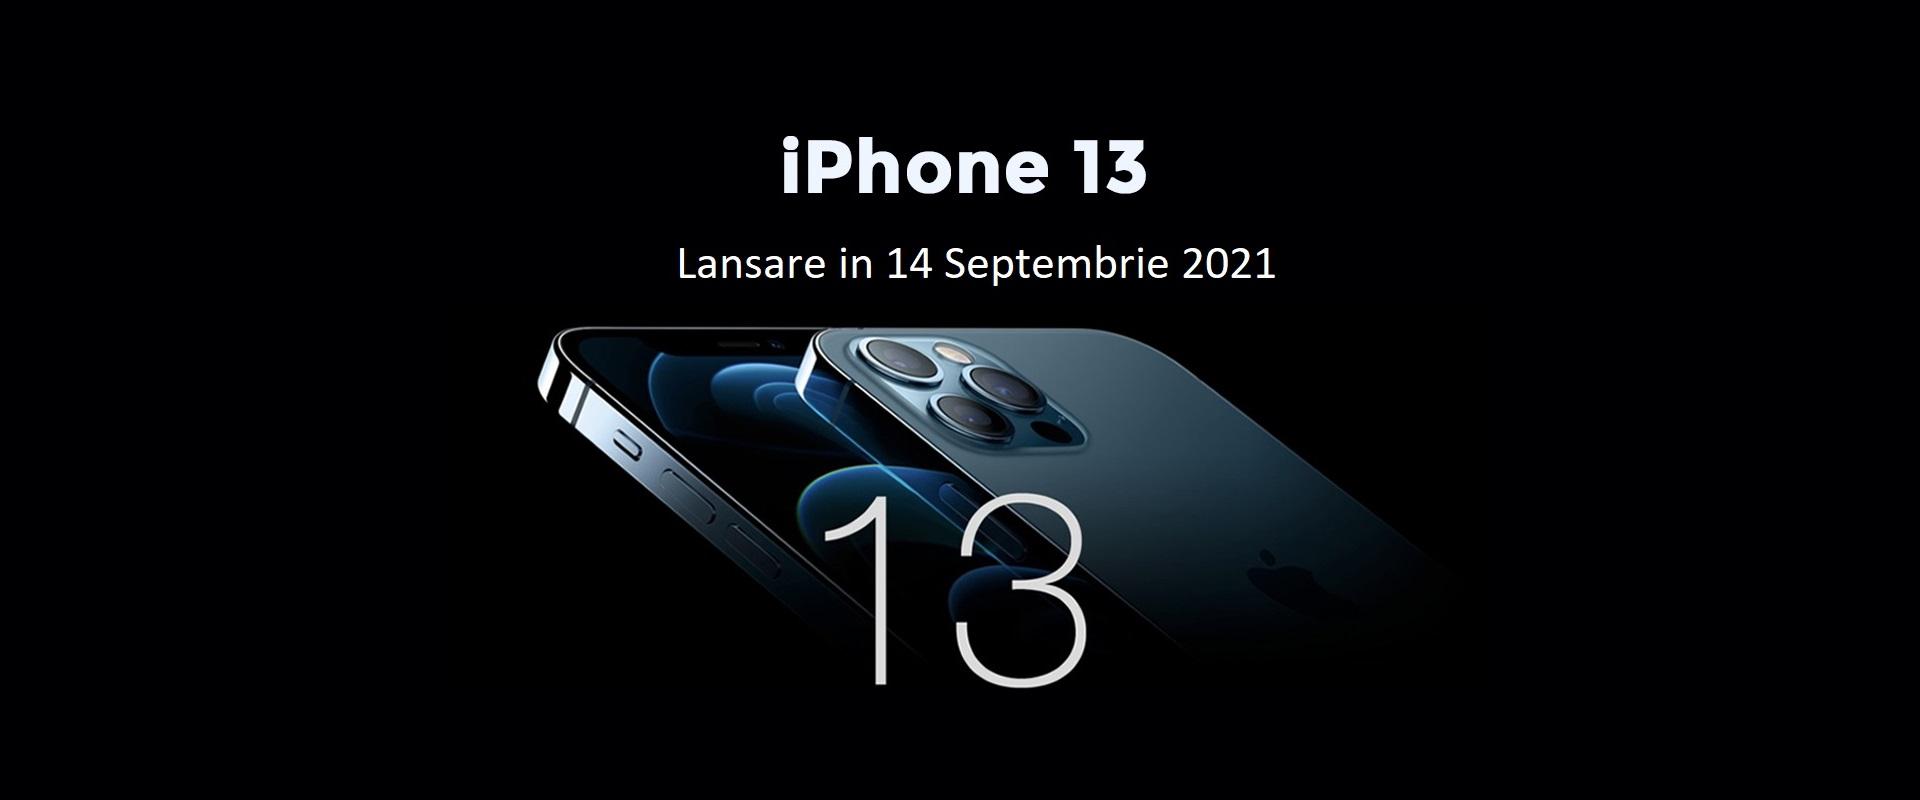 Iphone 13 se lanseaza in 14 Septembrie